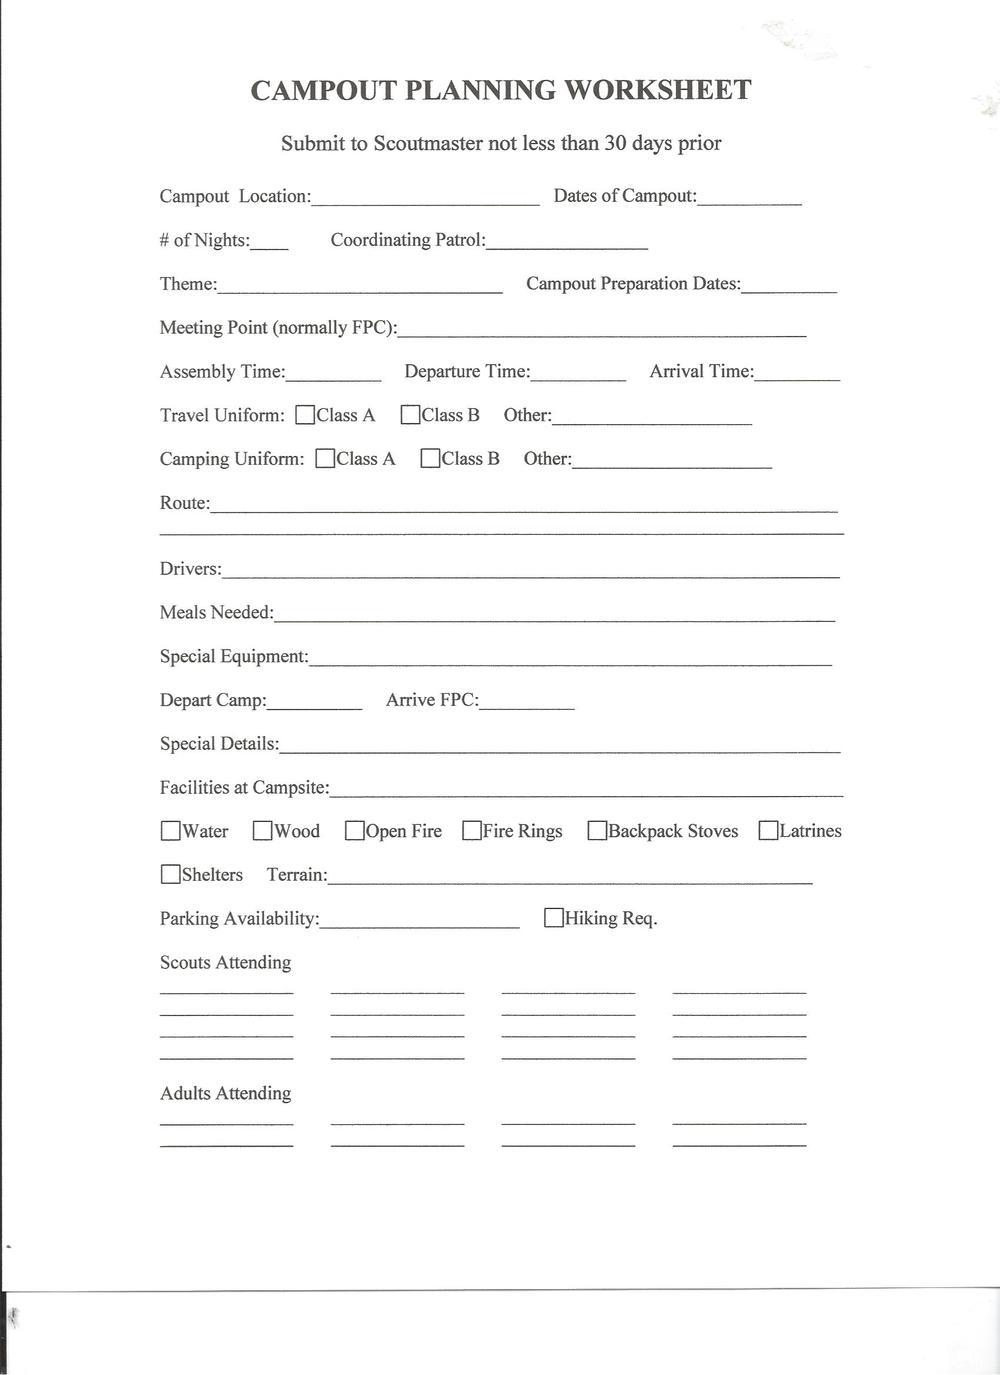 bsa worksheets - The Best and Most Comprehensive Worksheets